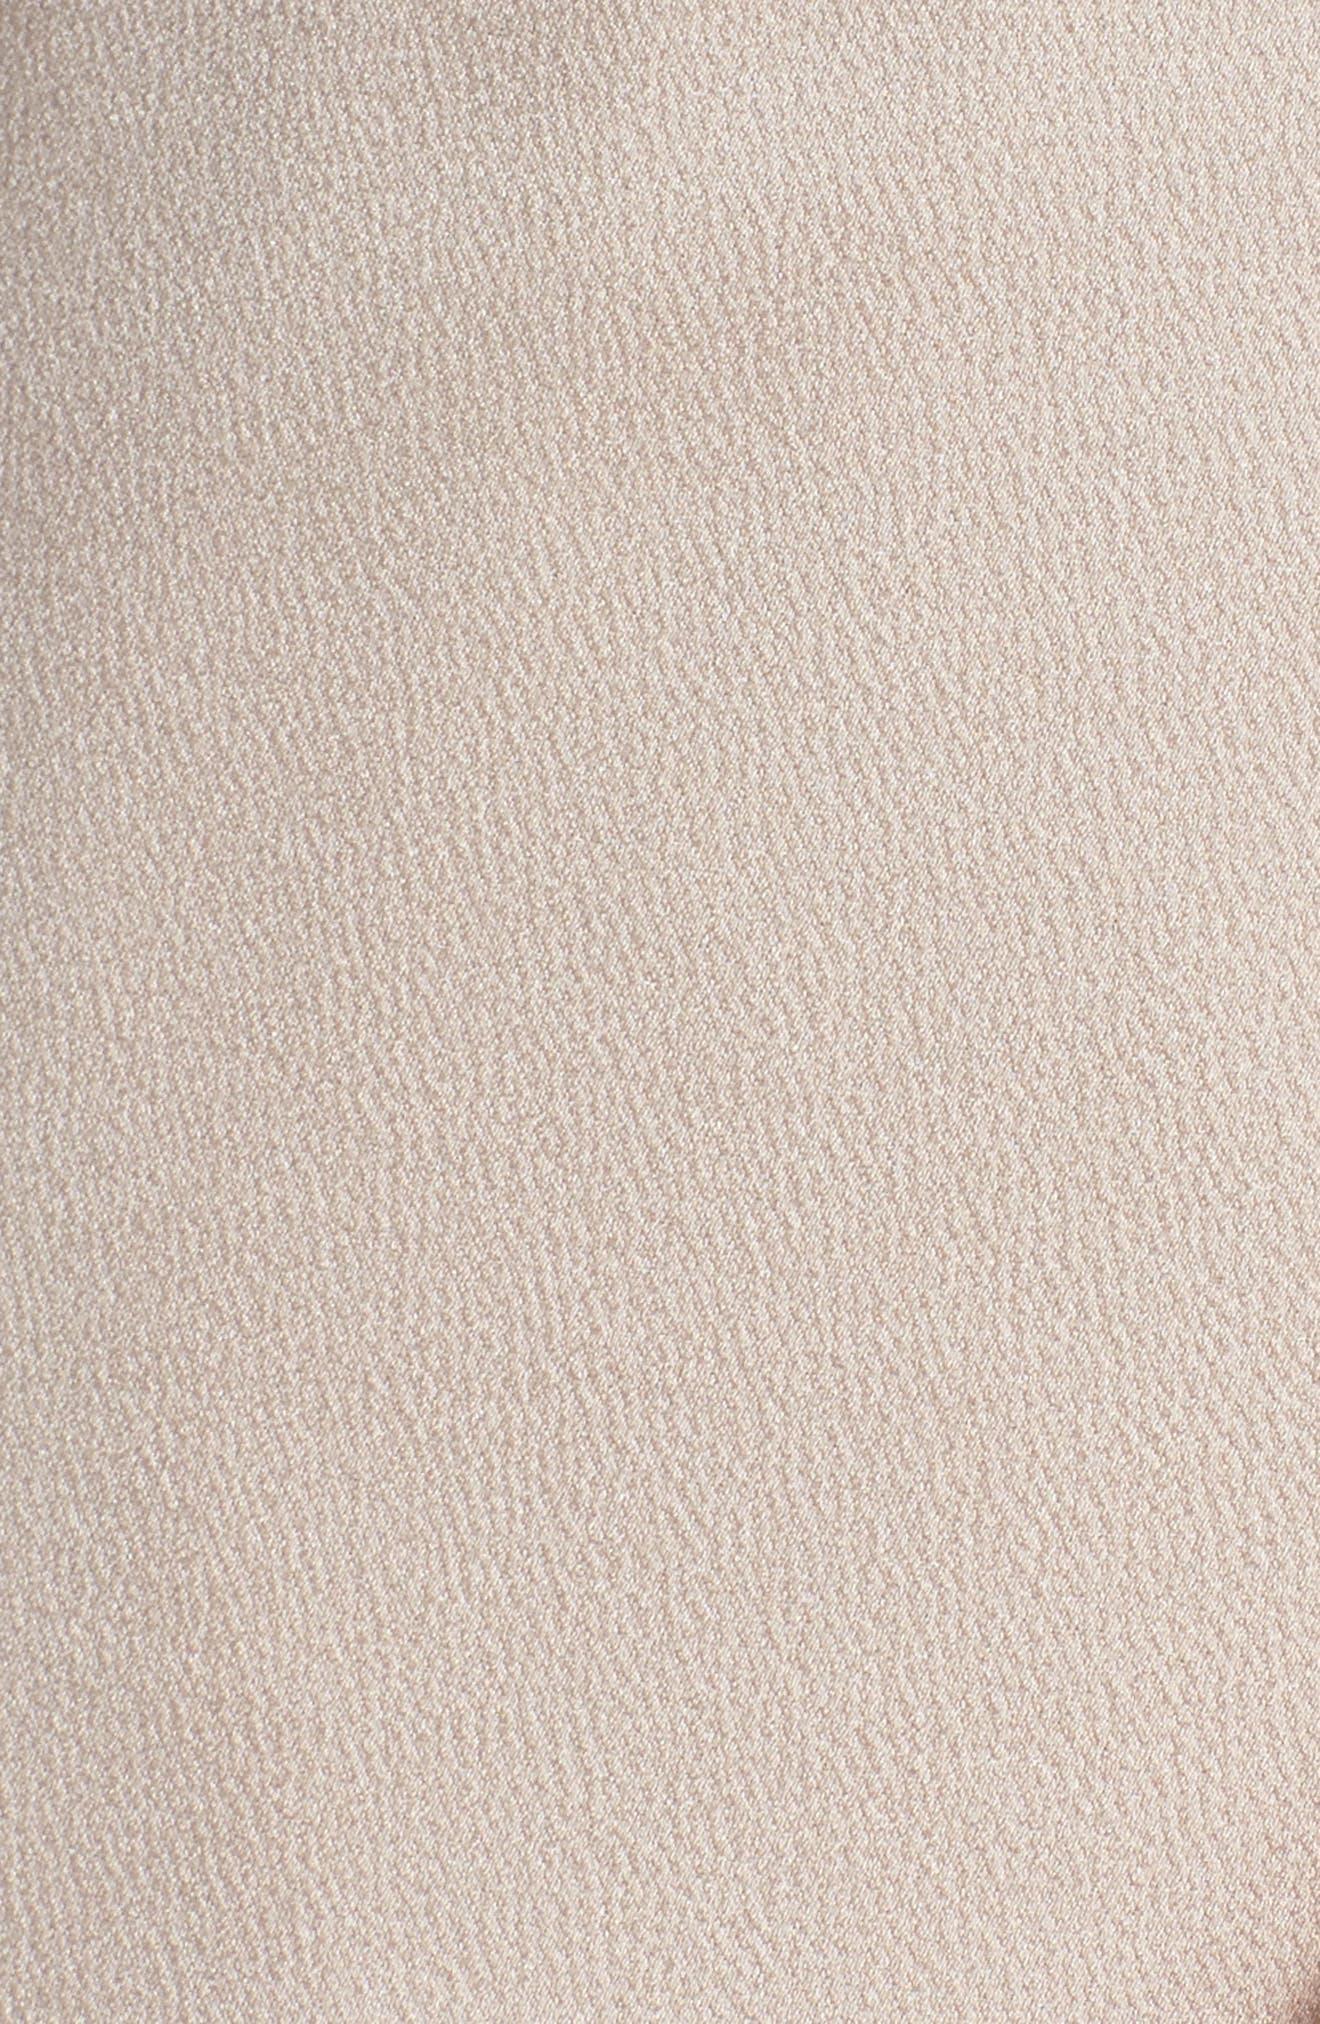 Luxe Asymmetrical Frill Maxi Dress,                             Alternate thumbnail 10, color,                             Porcelain